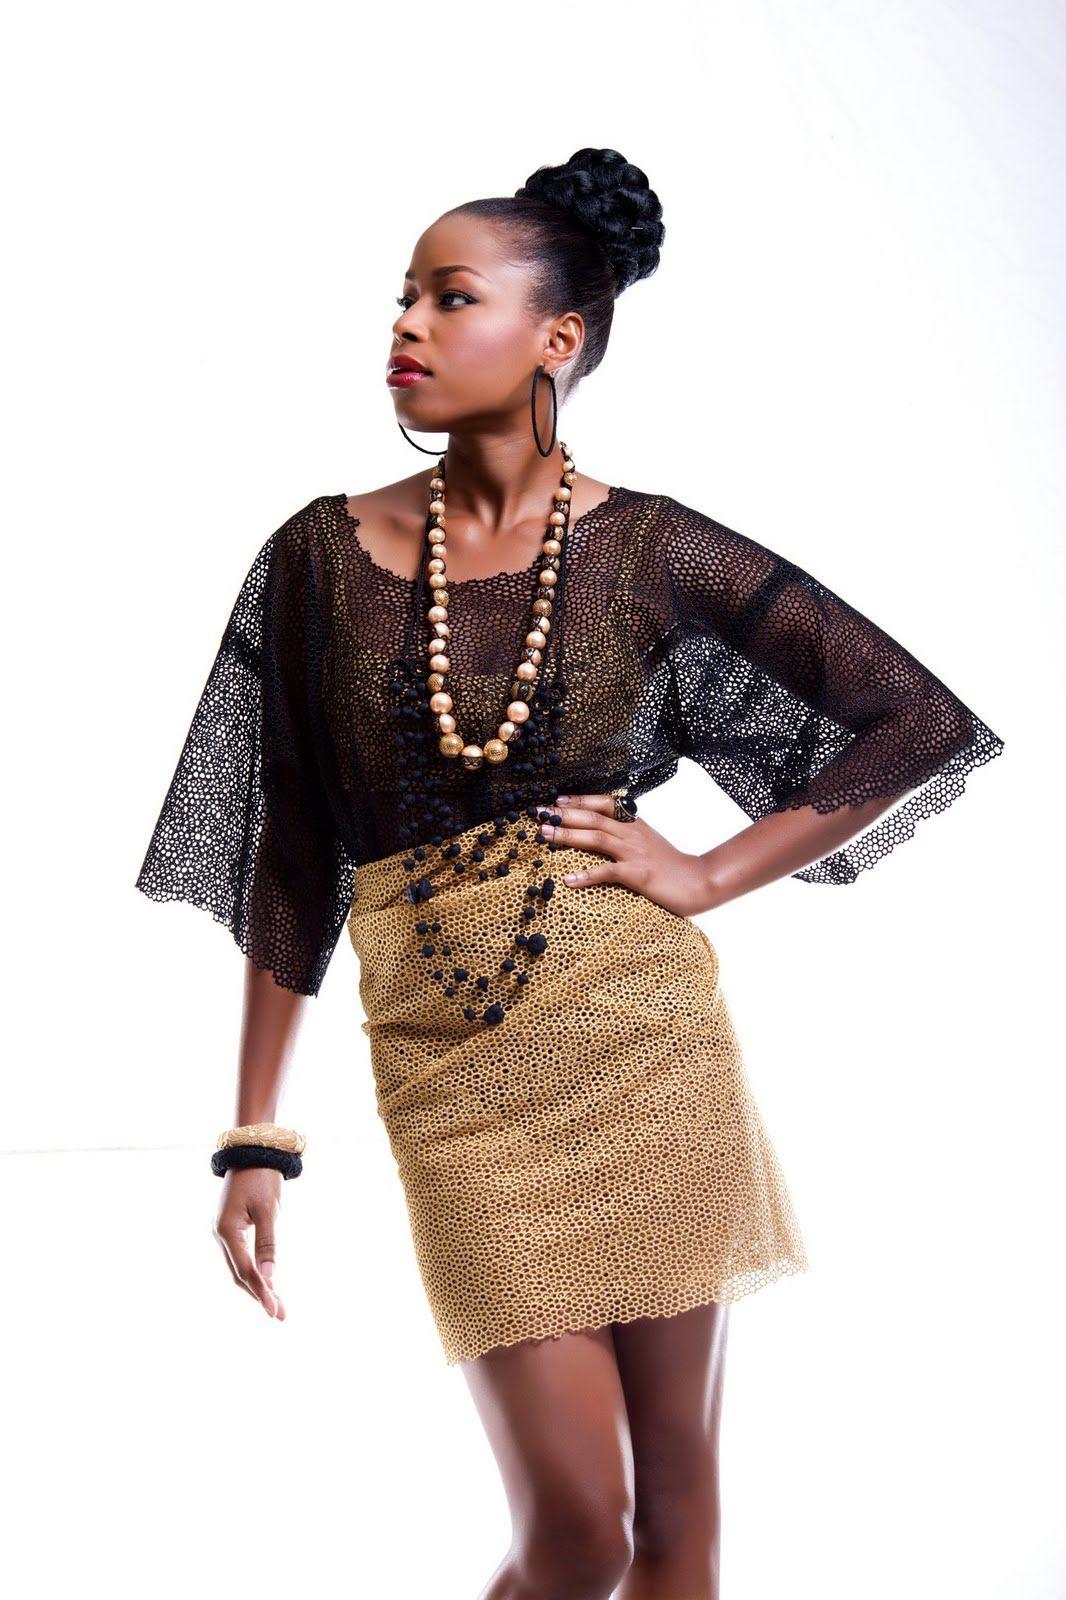 Style Pantry | Nigerian Fashion Documentary on Austrian Lace Trade #AfricanWeddings #Africanprints #Ethnicprints #Africanwomen #africanTradition #AfricanArt #AfricanStyle #AfricanBeads #Gele #Kente #Ankara #Nigerianfashion #Ghanaianfashion #Kenyanfashion #Burundifashion #senegalesefashion #Swahilifashion DKK